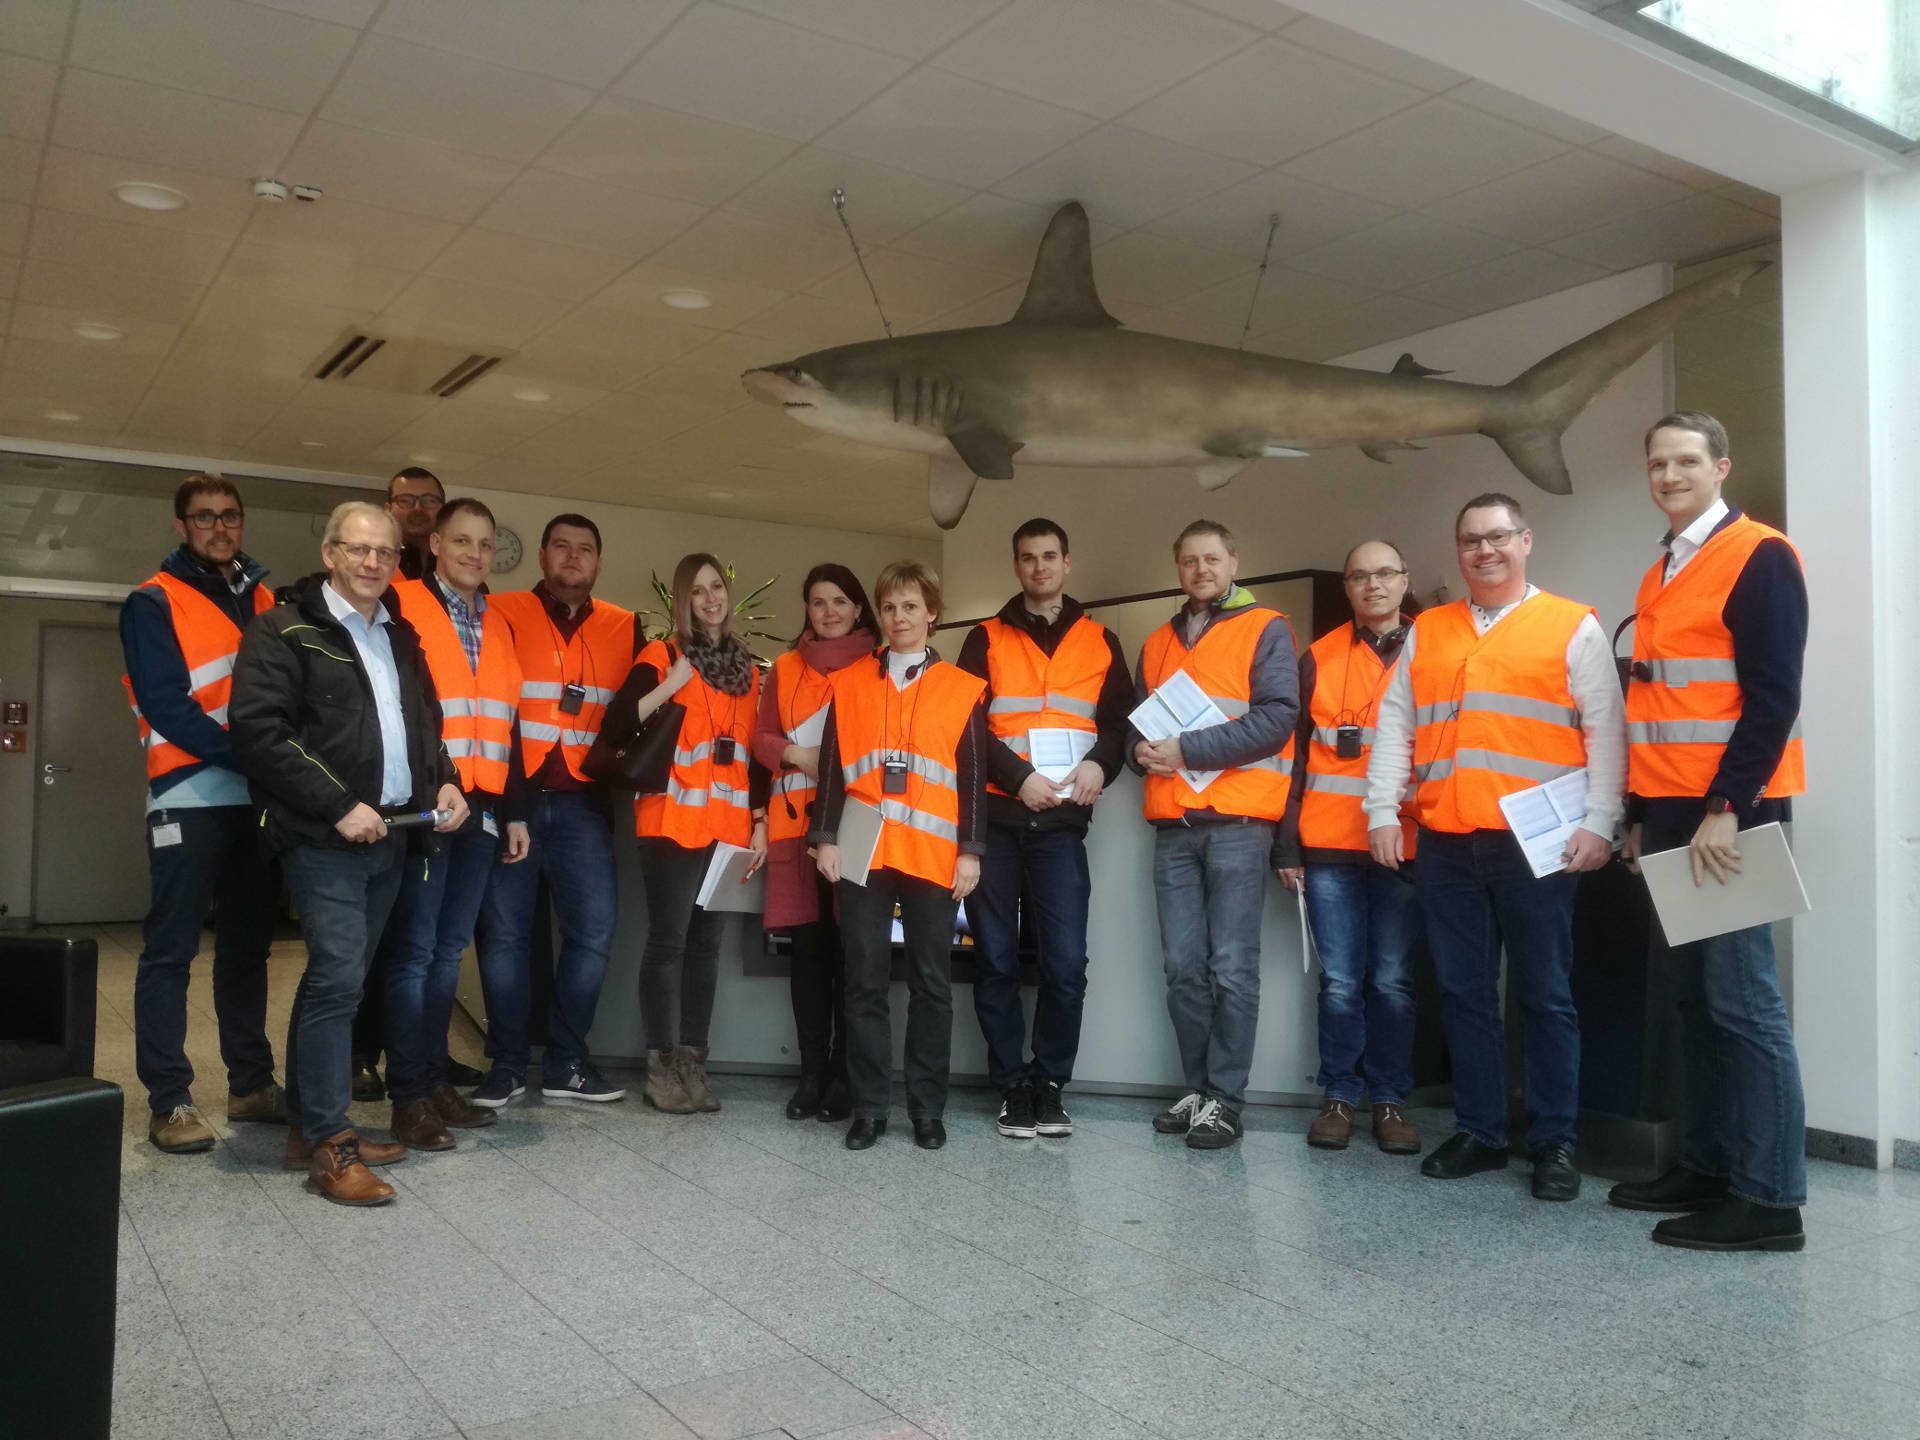 HAI - News - KVP-Plattform des Automobil-Cluster OÖ zu Gast bei HAI